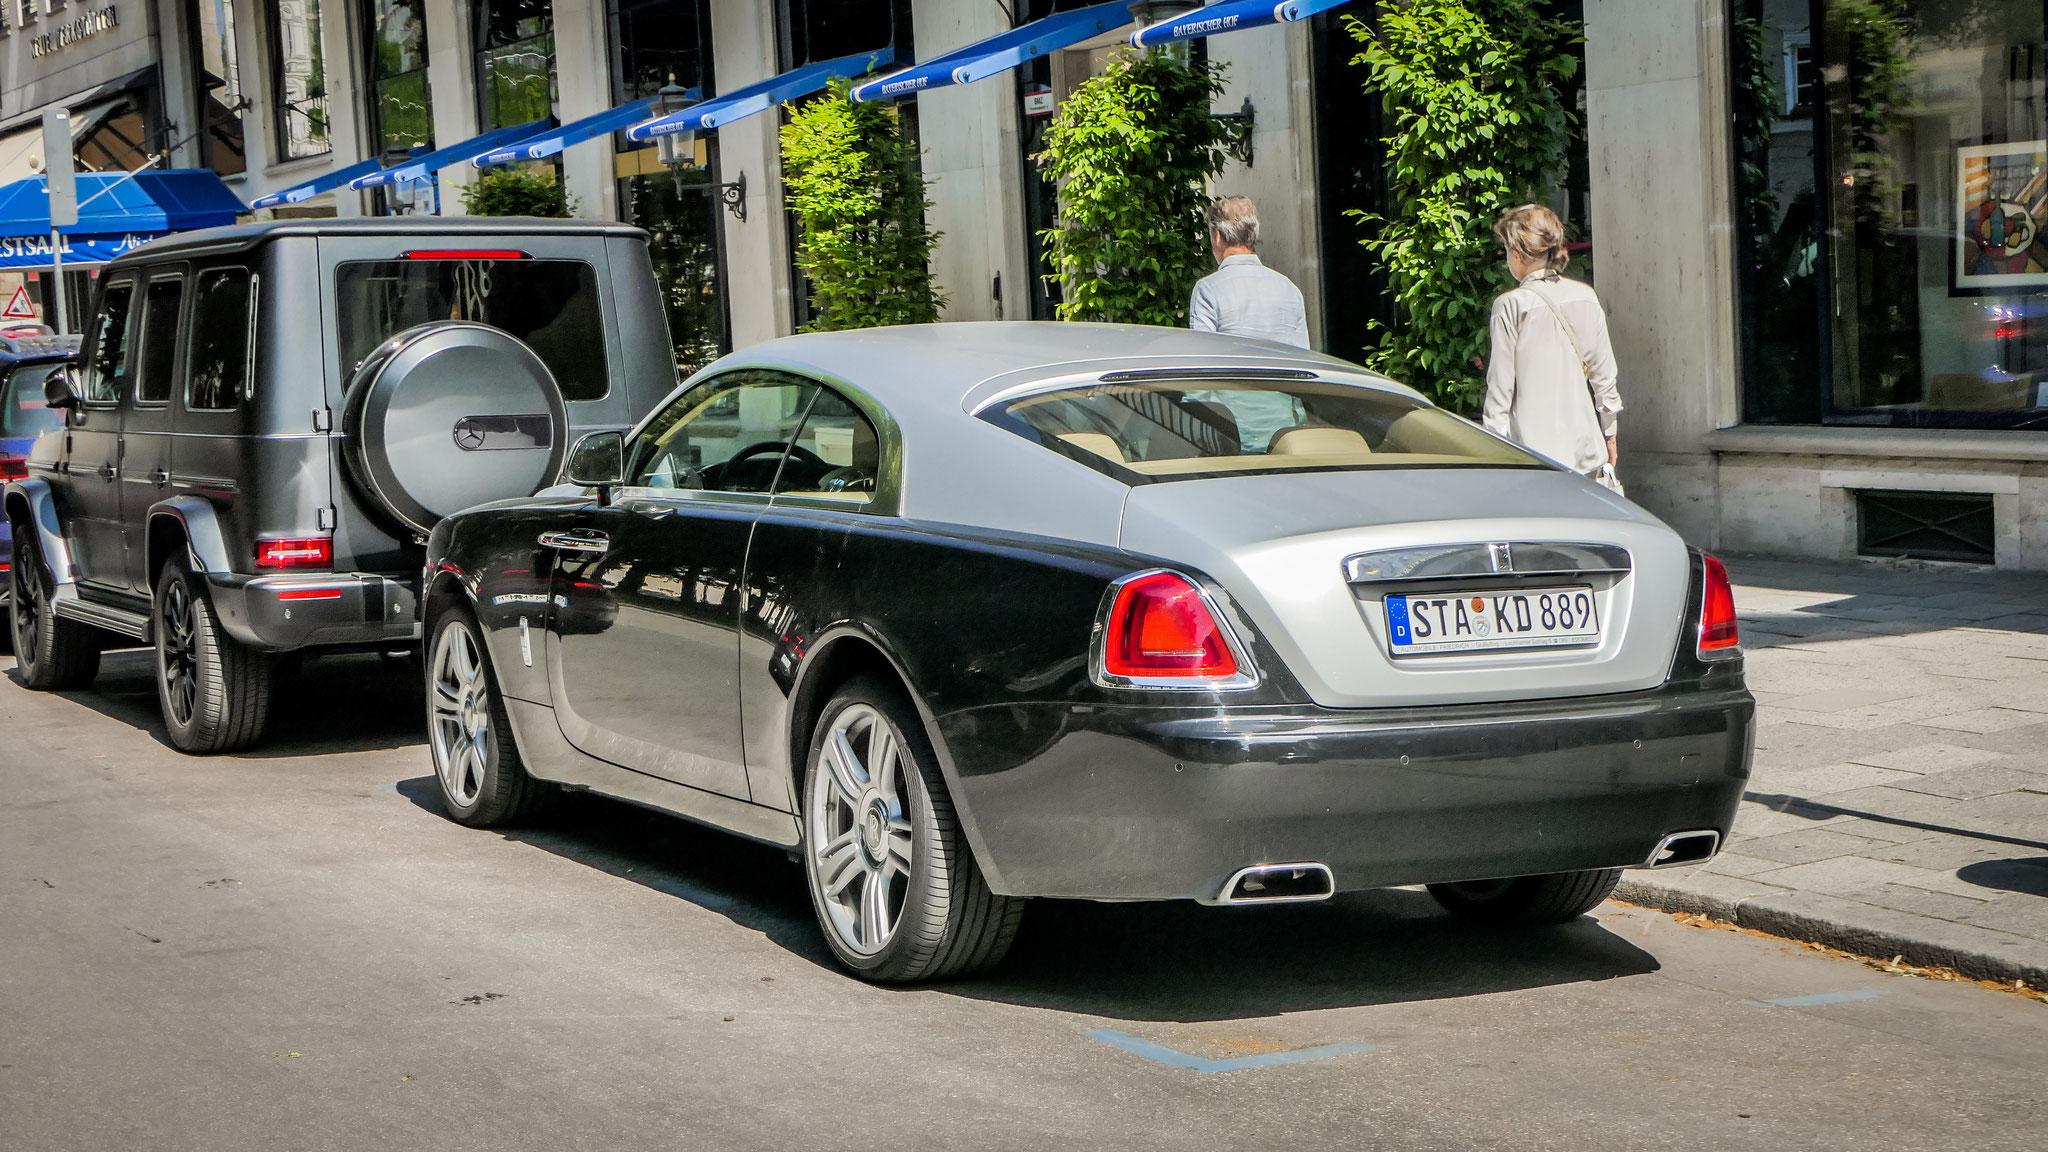 Rolls Royce Wraith - STA-KD-889